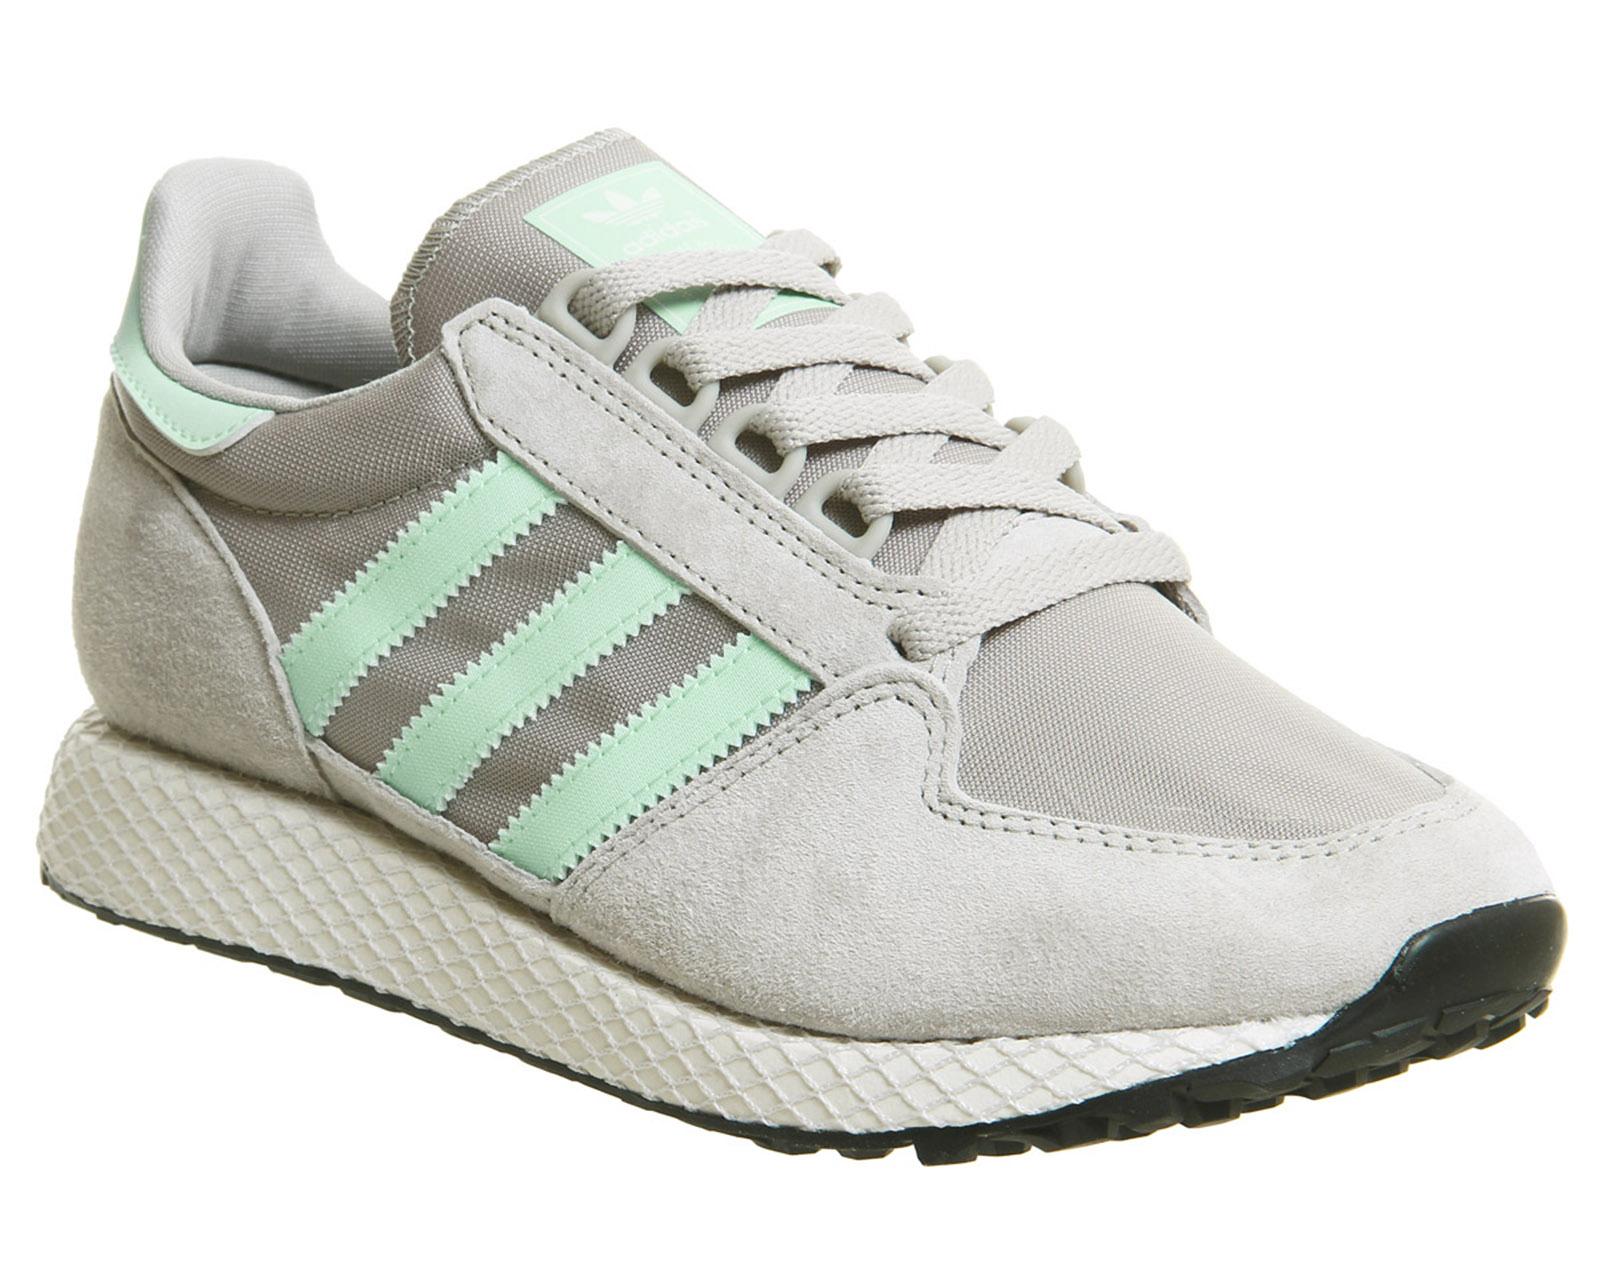 best service bd4da 94e90 SENTINEL Womens Adidas Forest Grove formatori sesamo nero scarpe da  ginnastica scarpe bianco